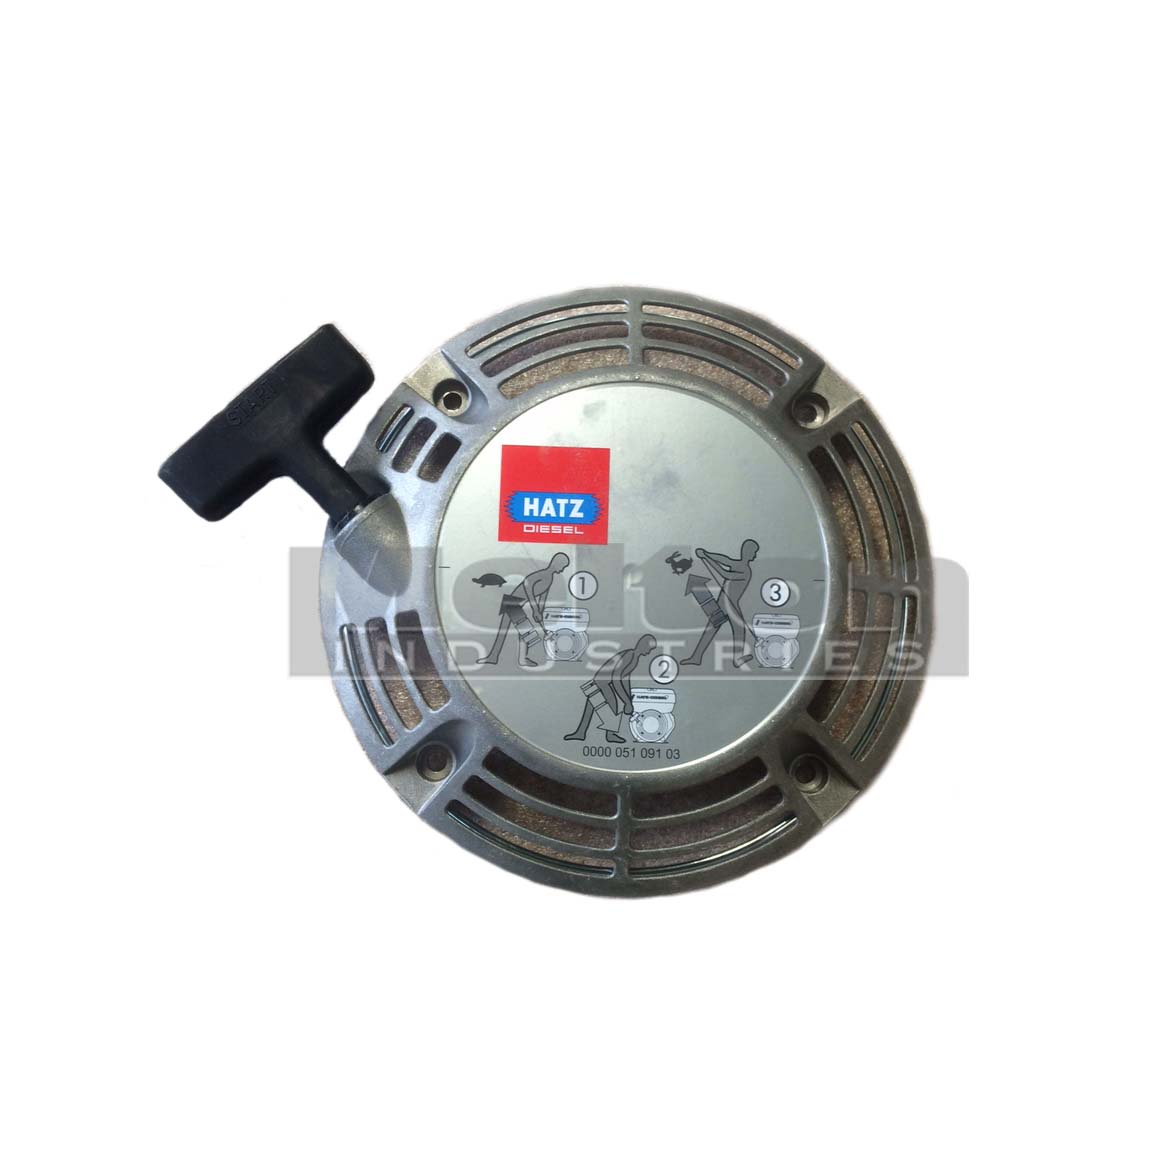 hatz diesel recoil starter assembly 02319100